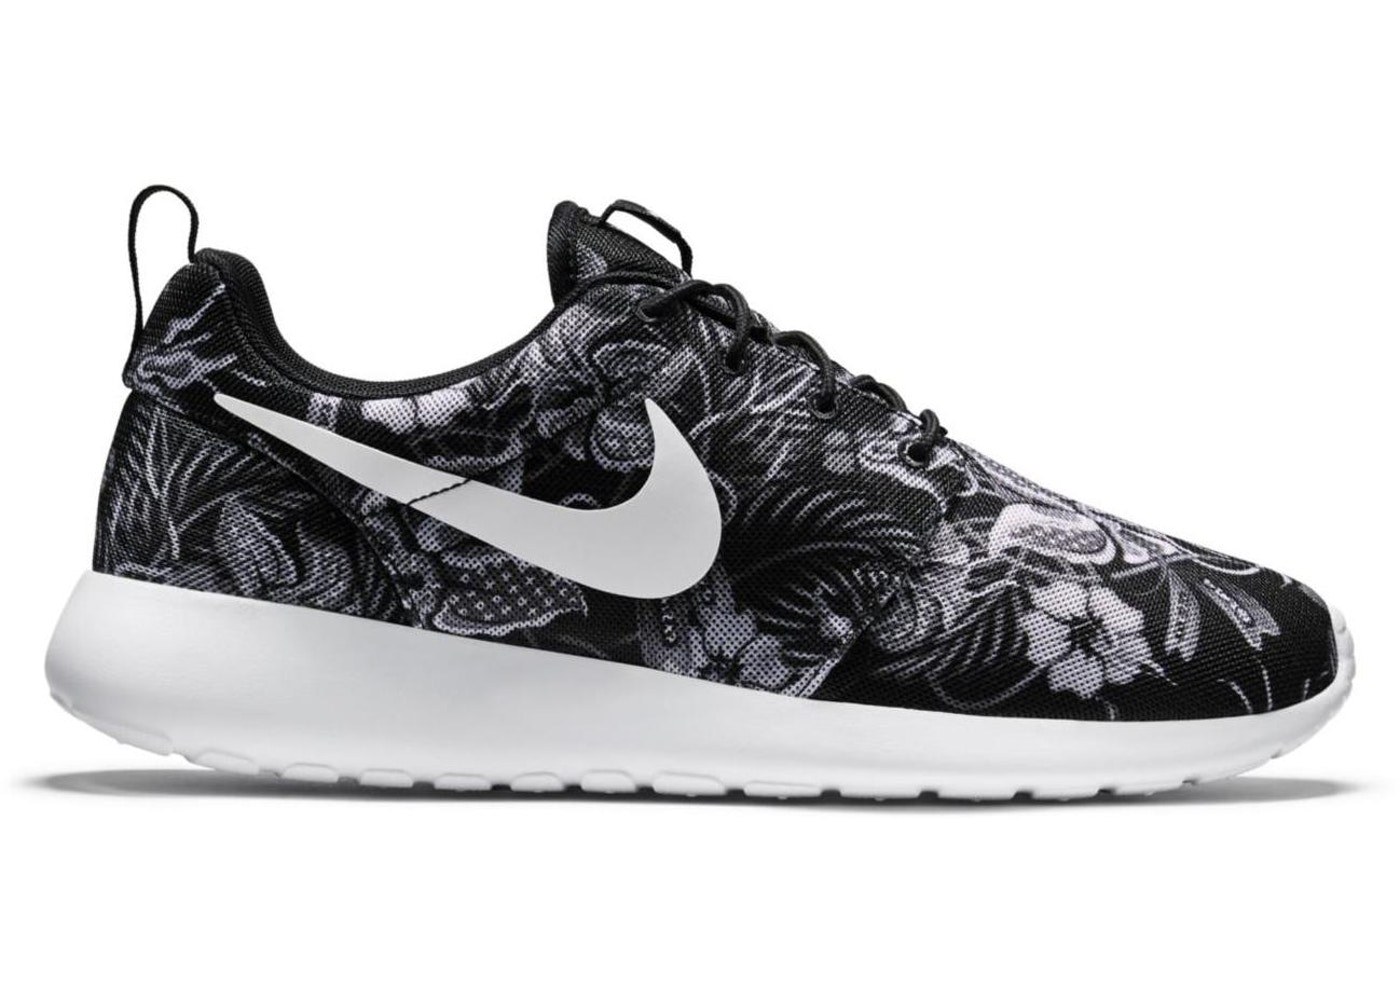 new concept 563c0 61310 Nike Roshe Run Floral Print Black - 655206-018